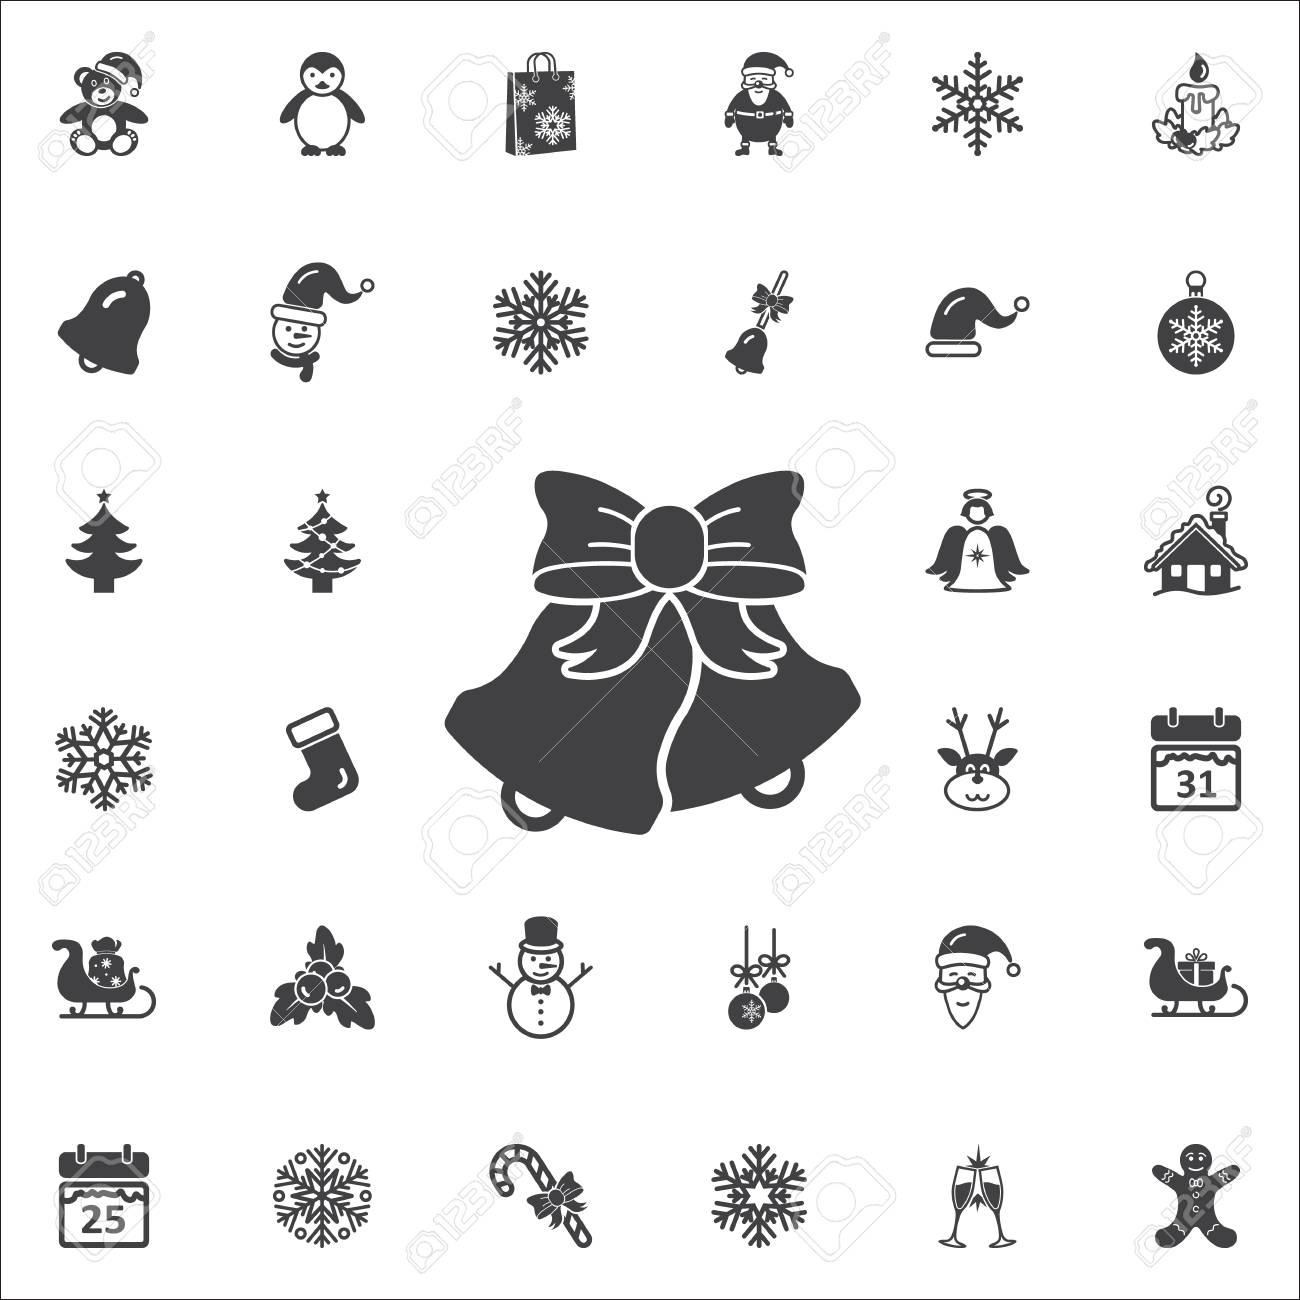 Christmas Holidays Icon.Christmas Bell Icon New Year Set Of Icons Christmas Holidays